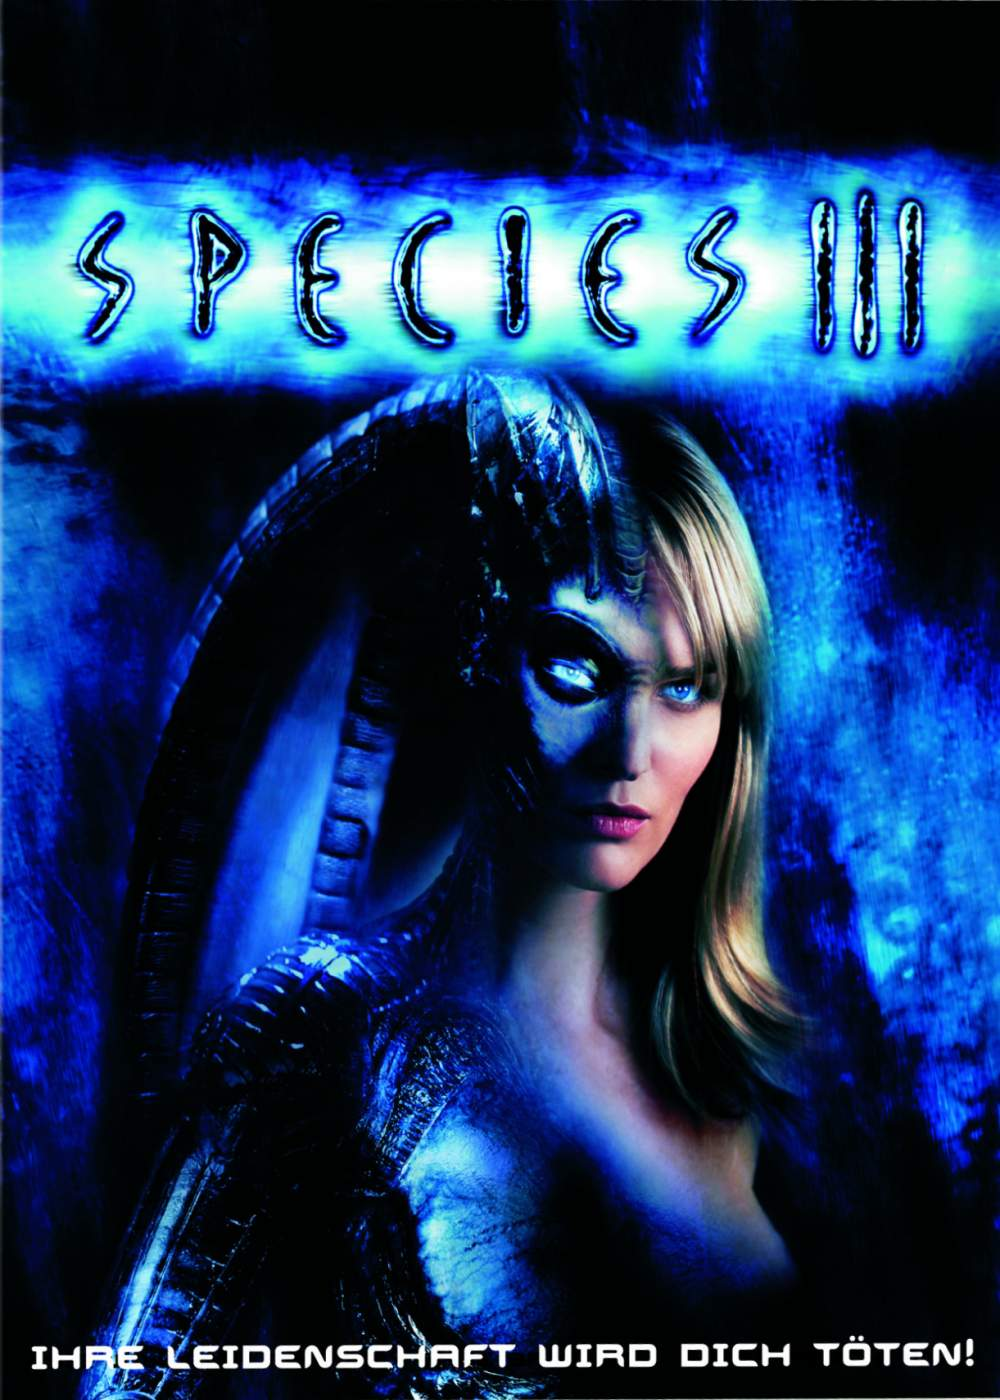 Interactive dvd erotic blu ray